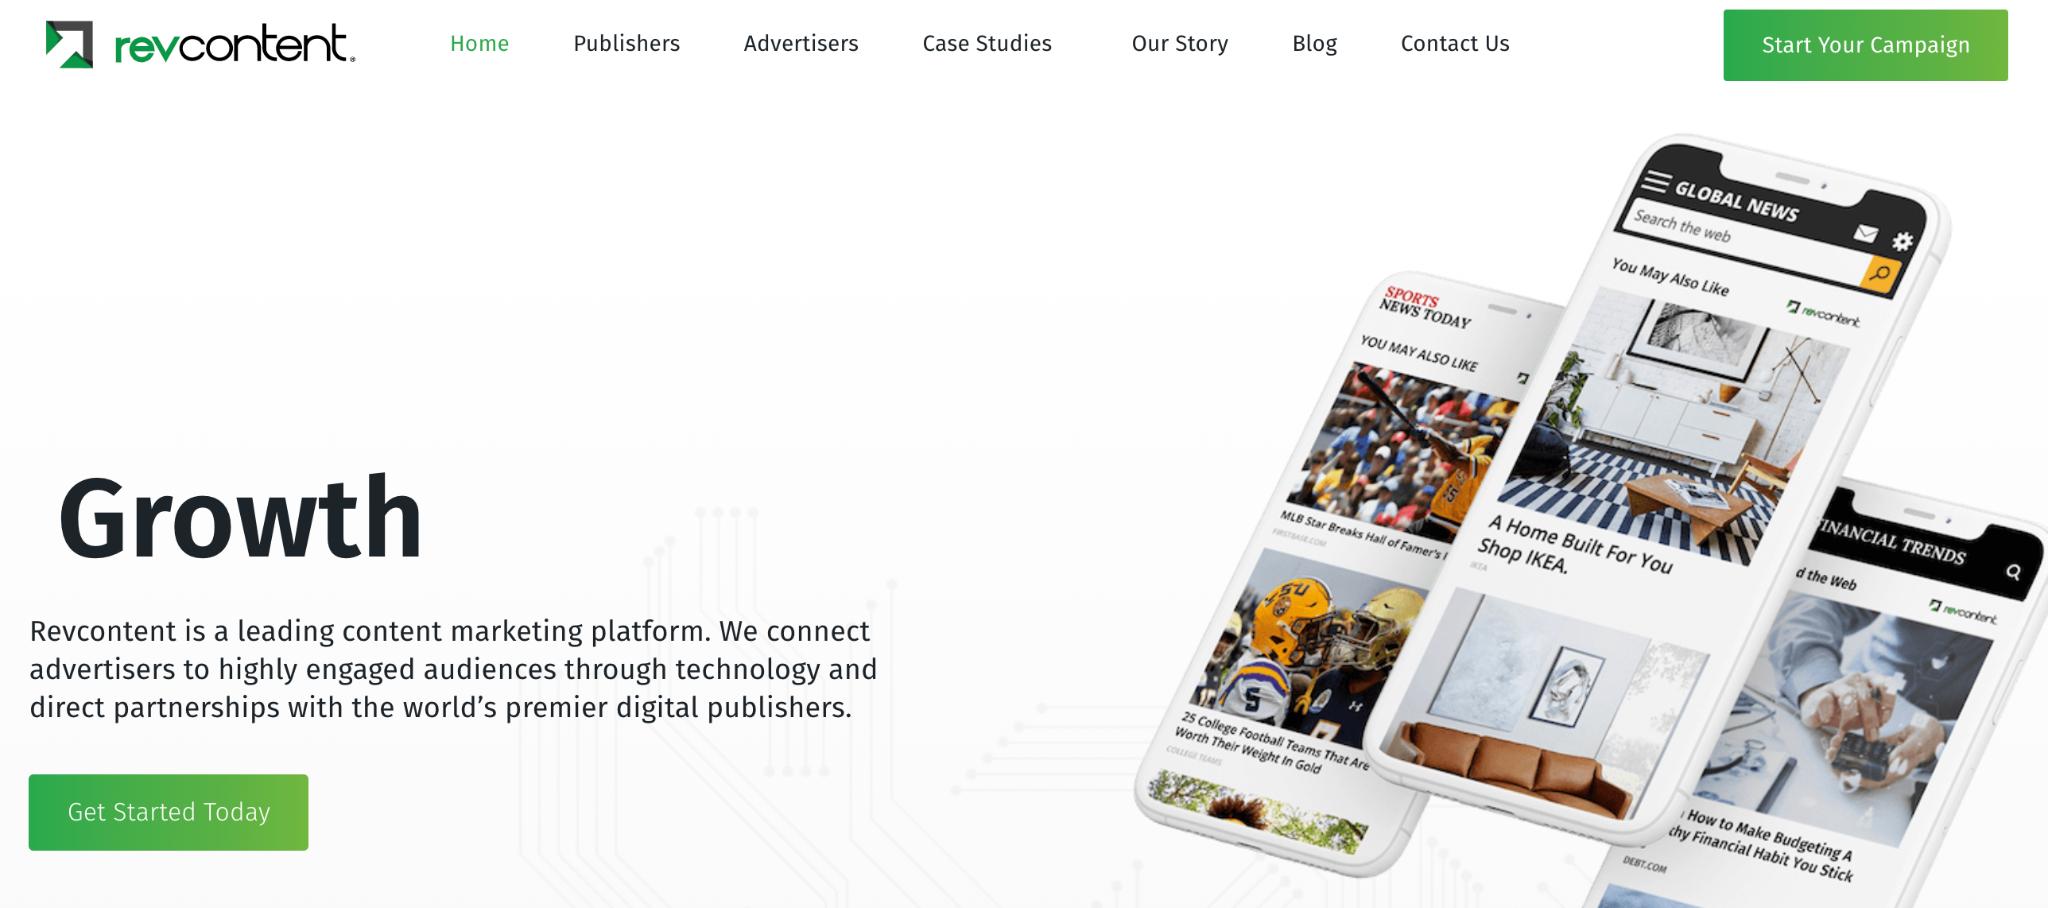 RevContent native advertising platform homepage